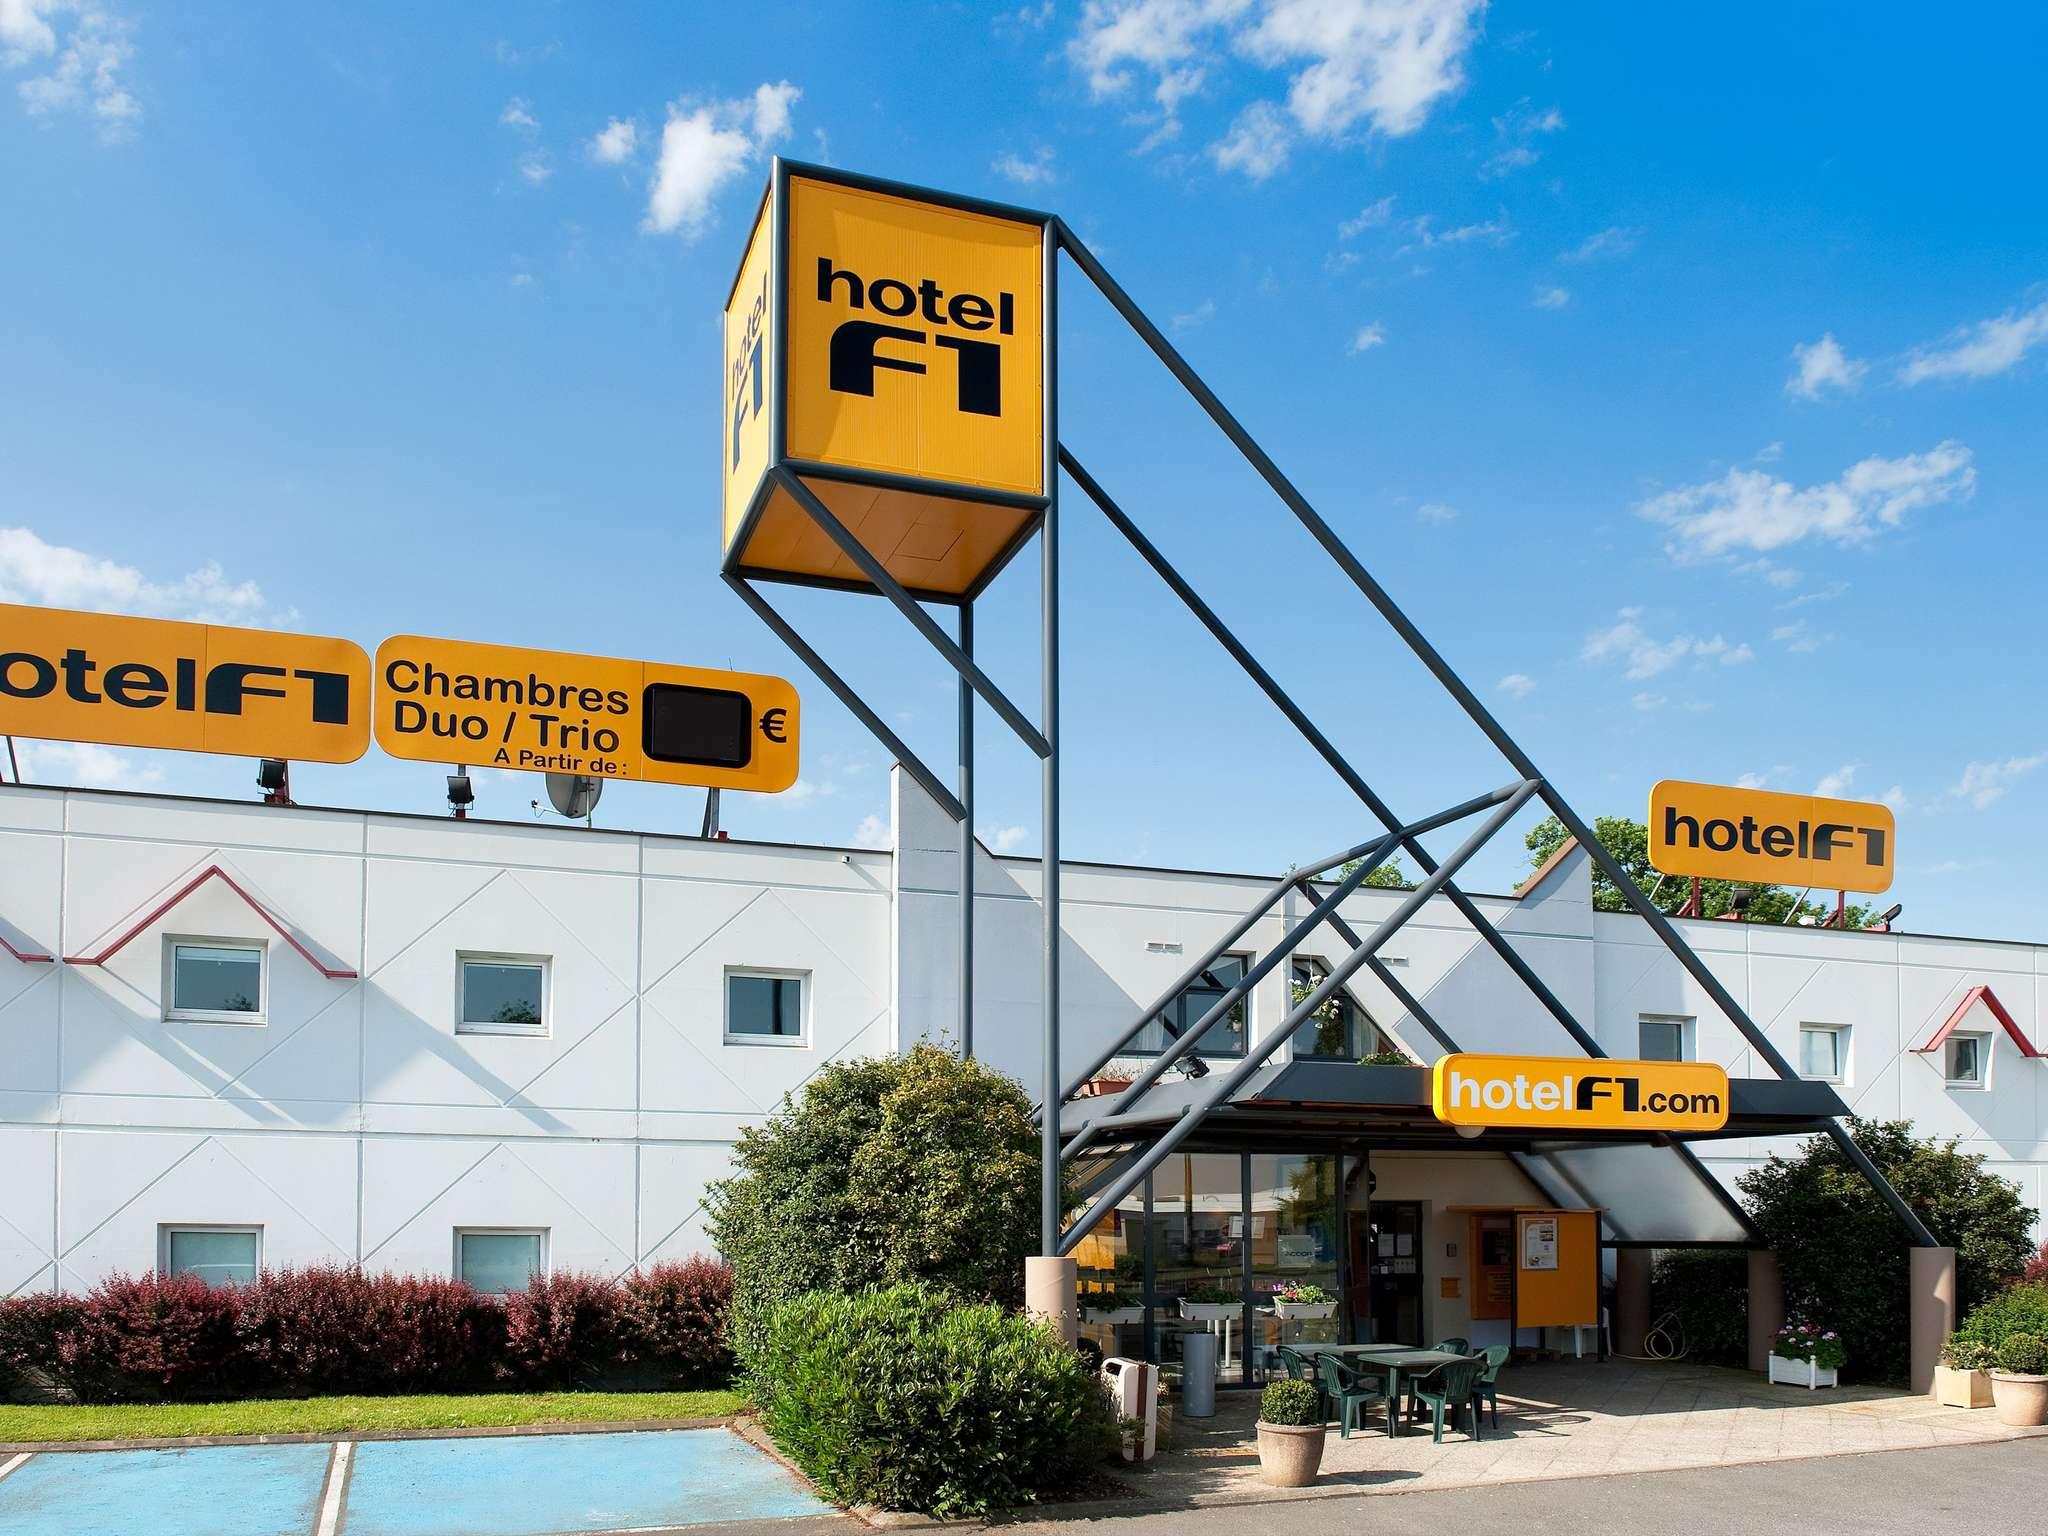 hotel in vallauris hotelf1 antibes sophia antipolis. Black Bedroom Furniture Sets. Home Design Ideas